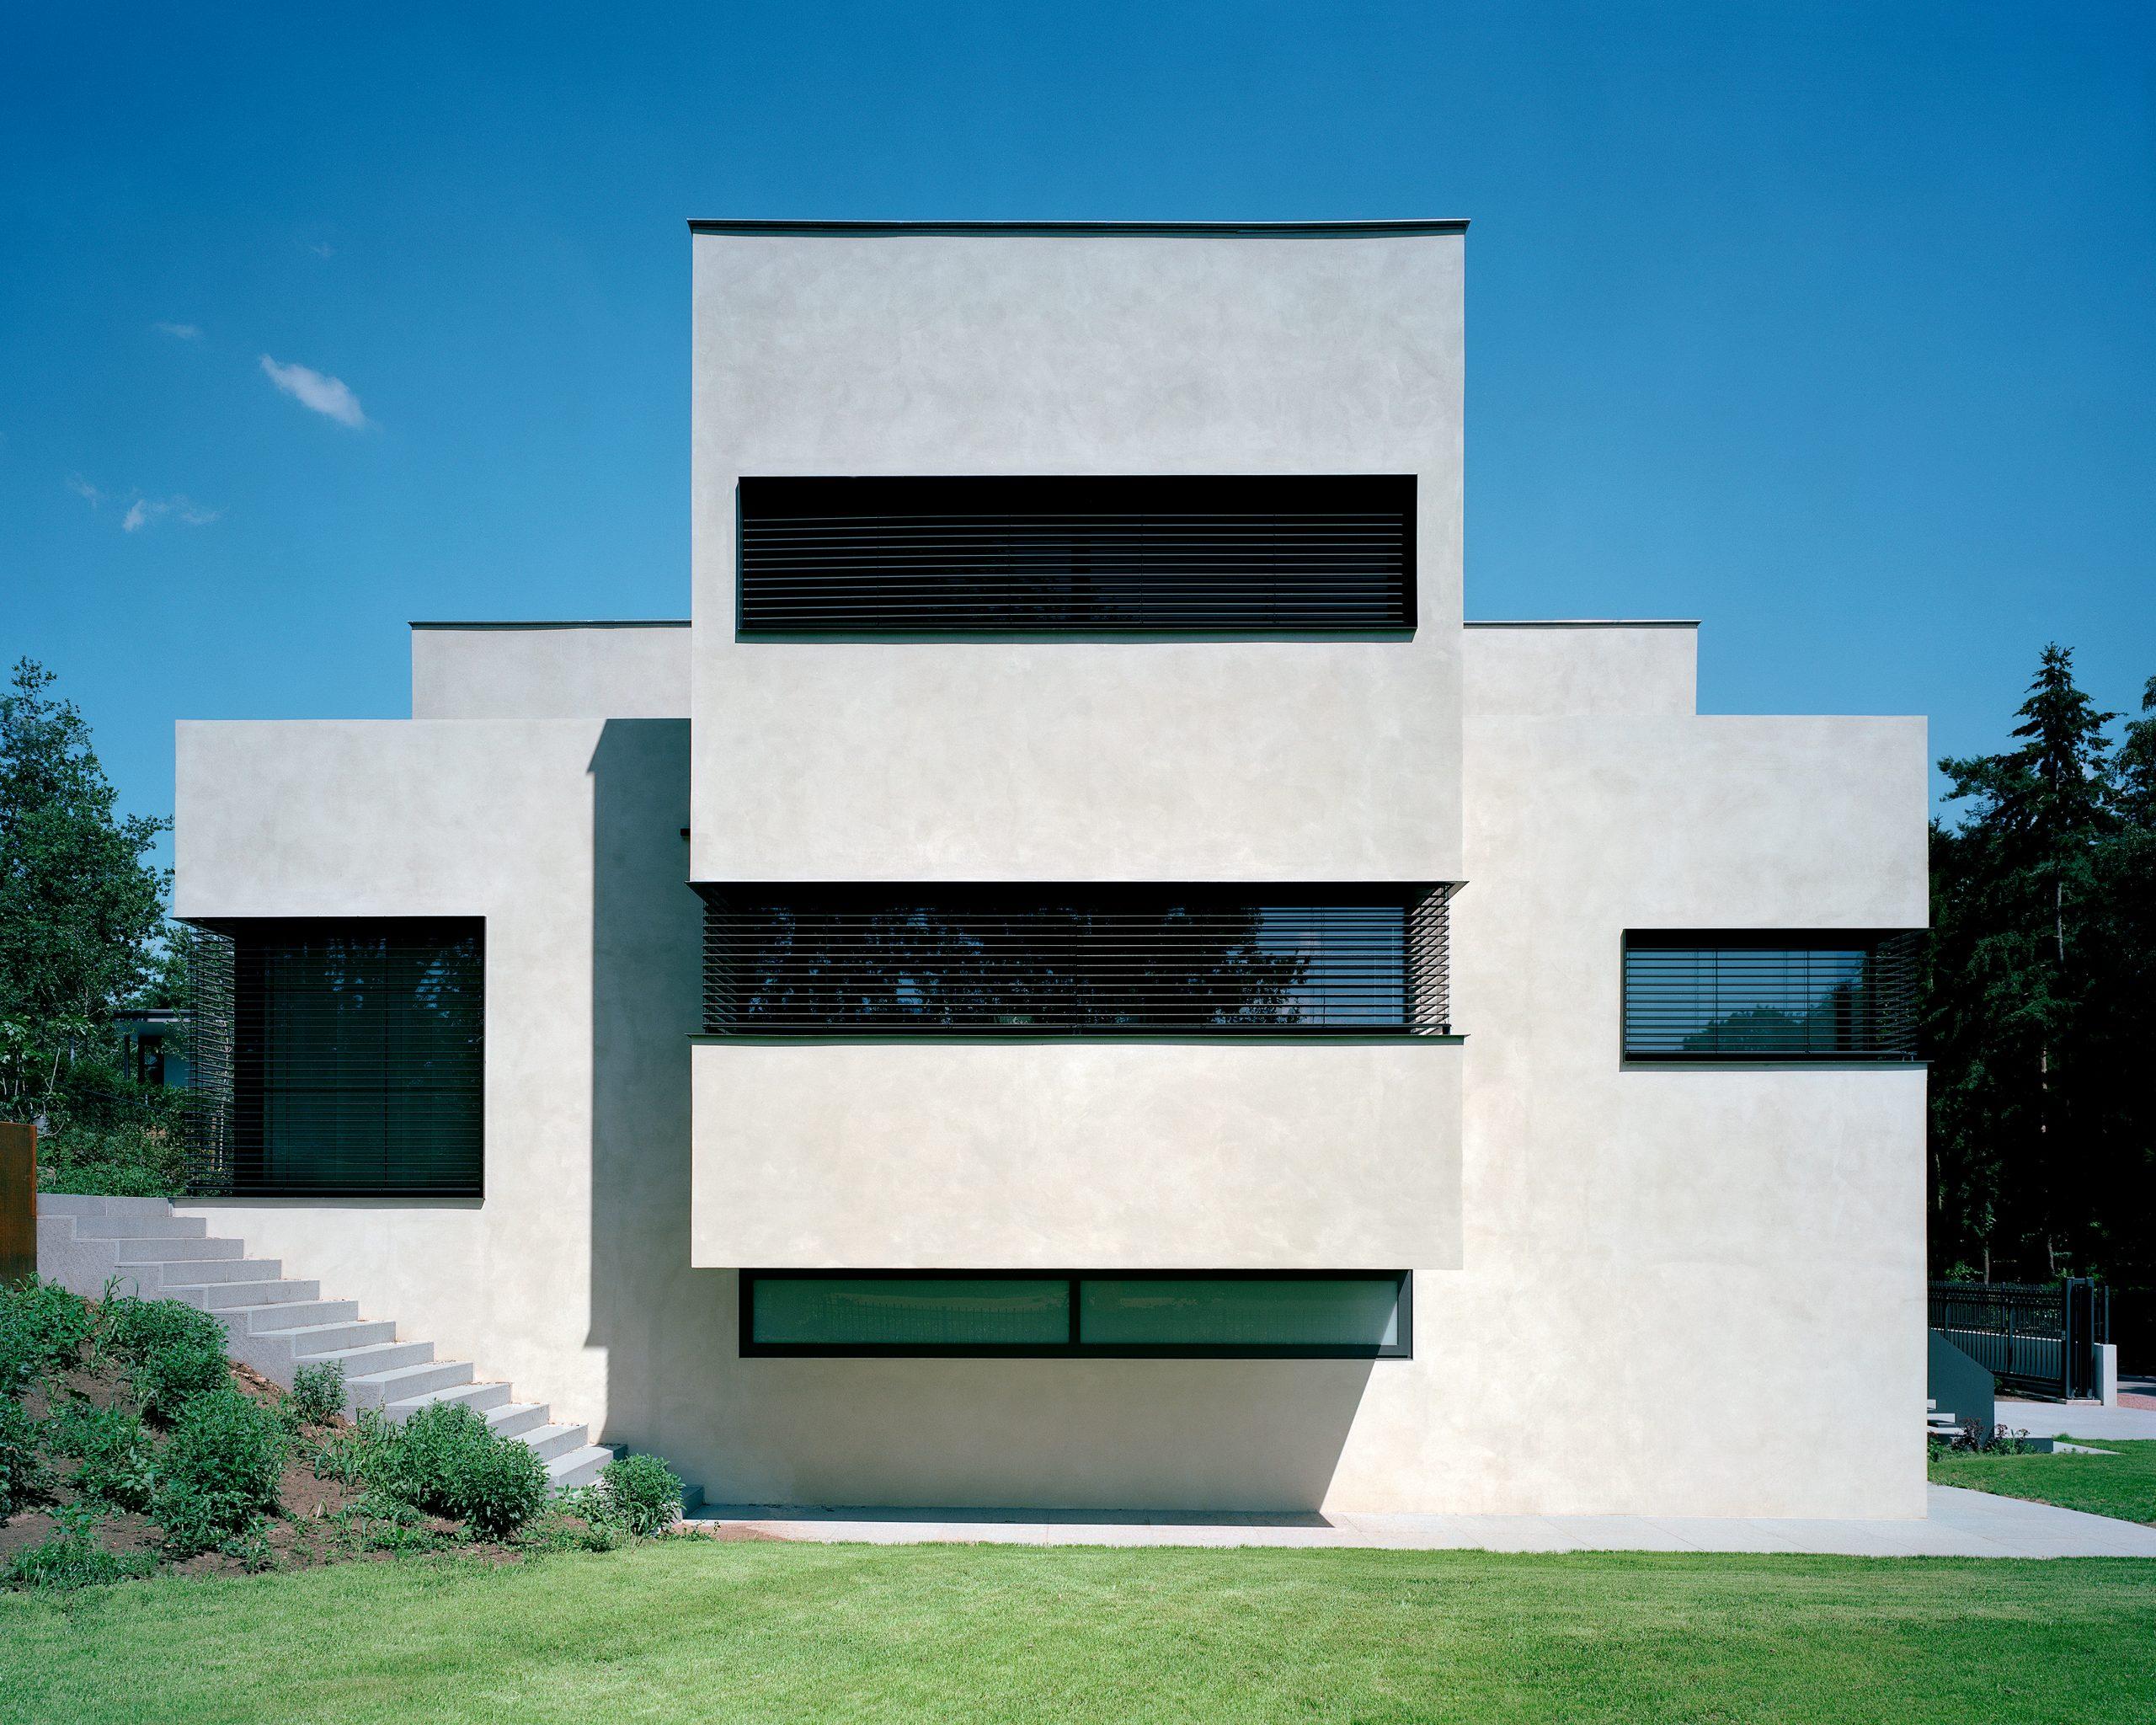 Green zone house design